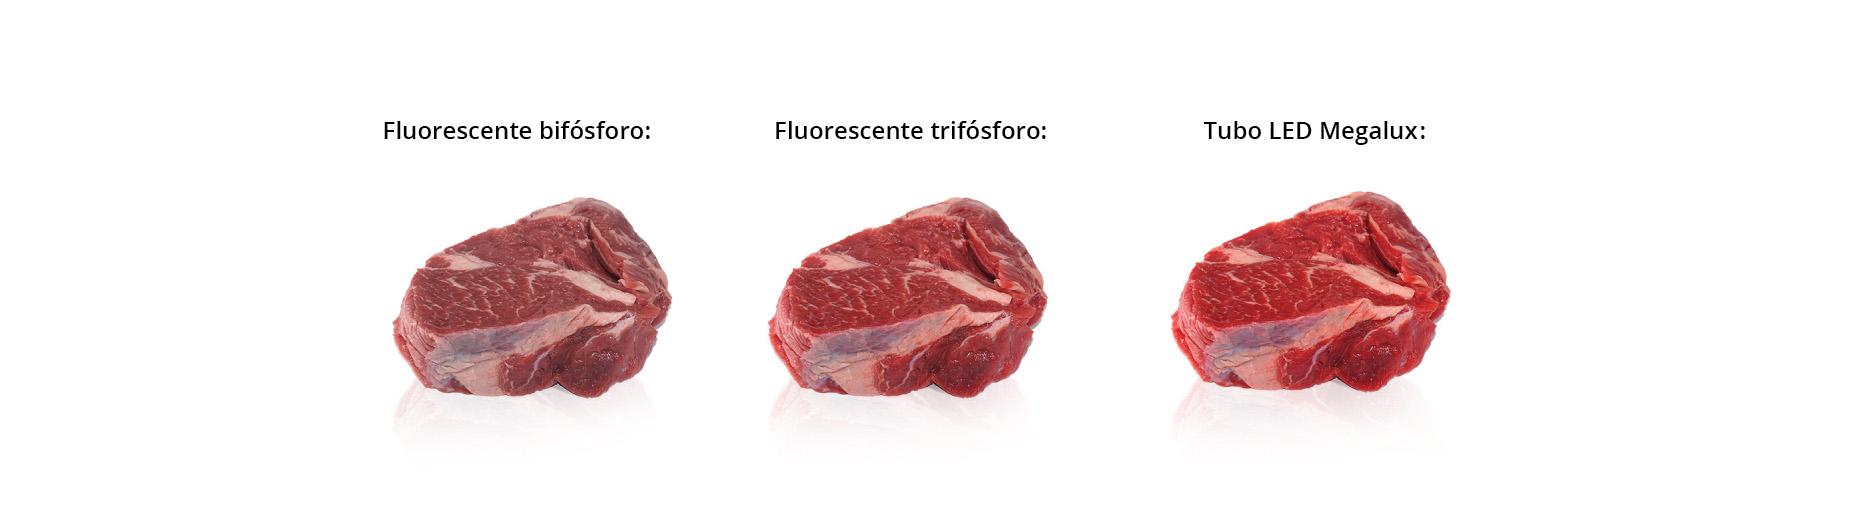 tubo-meat-sample web